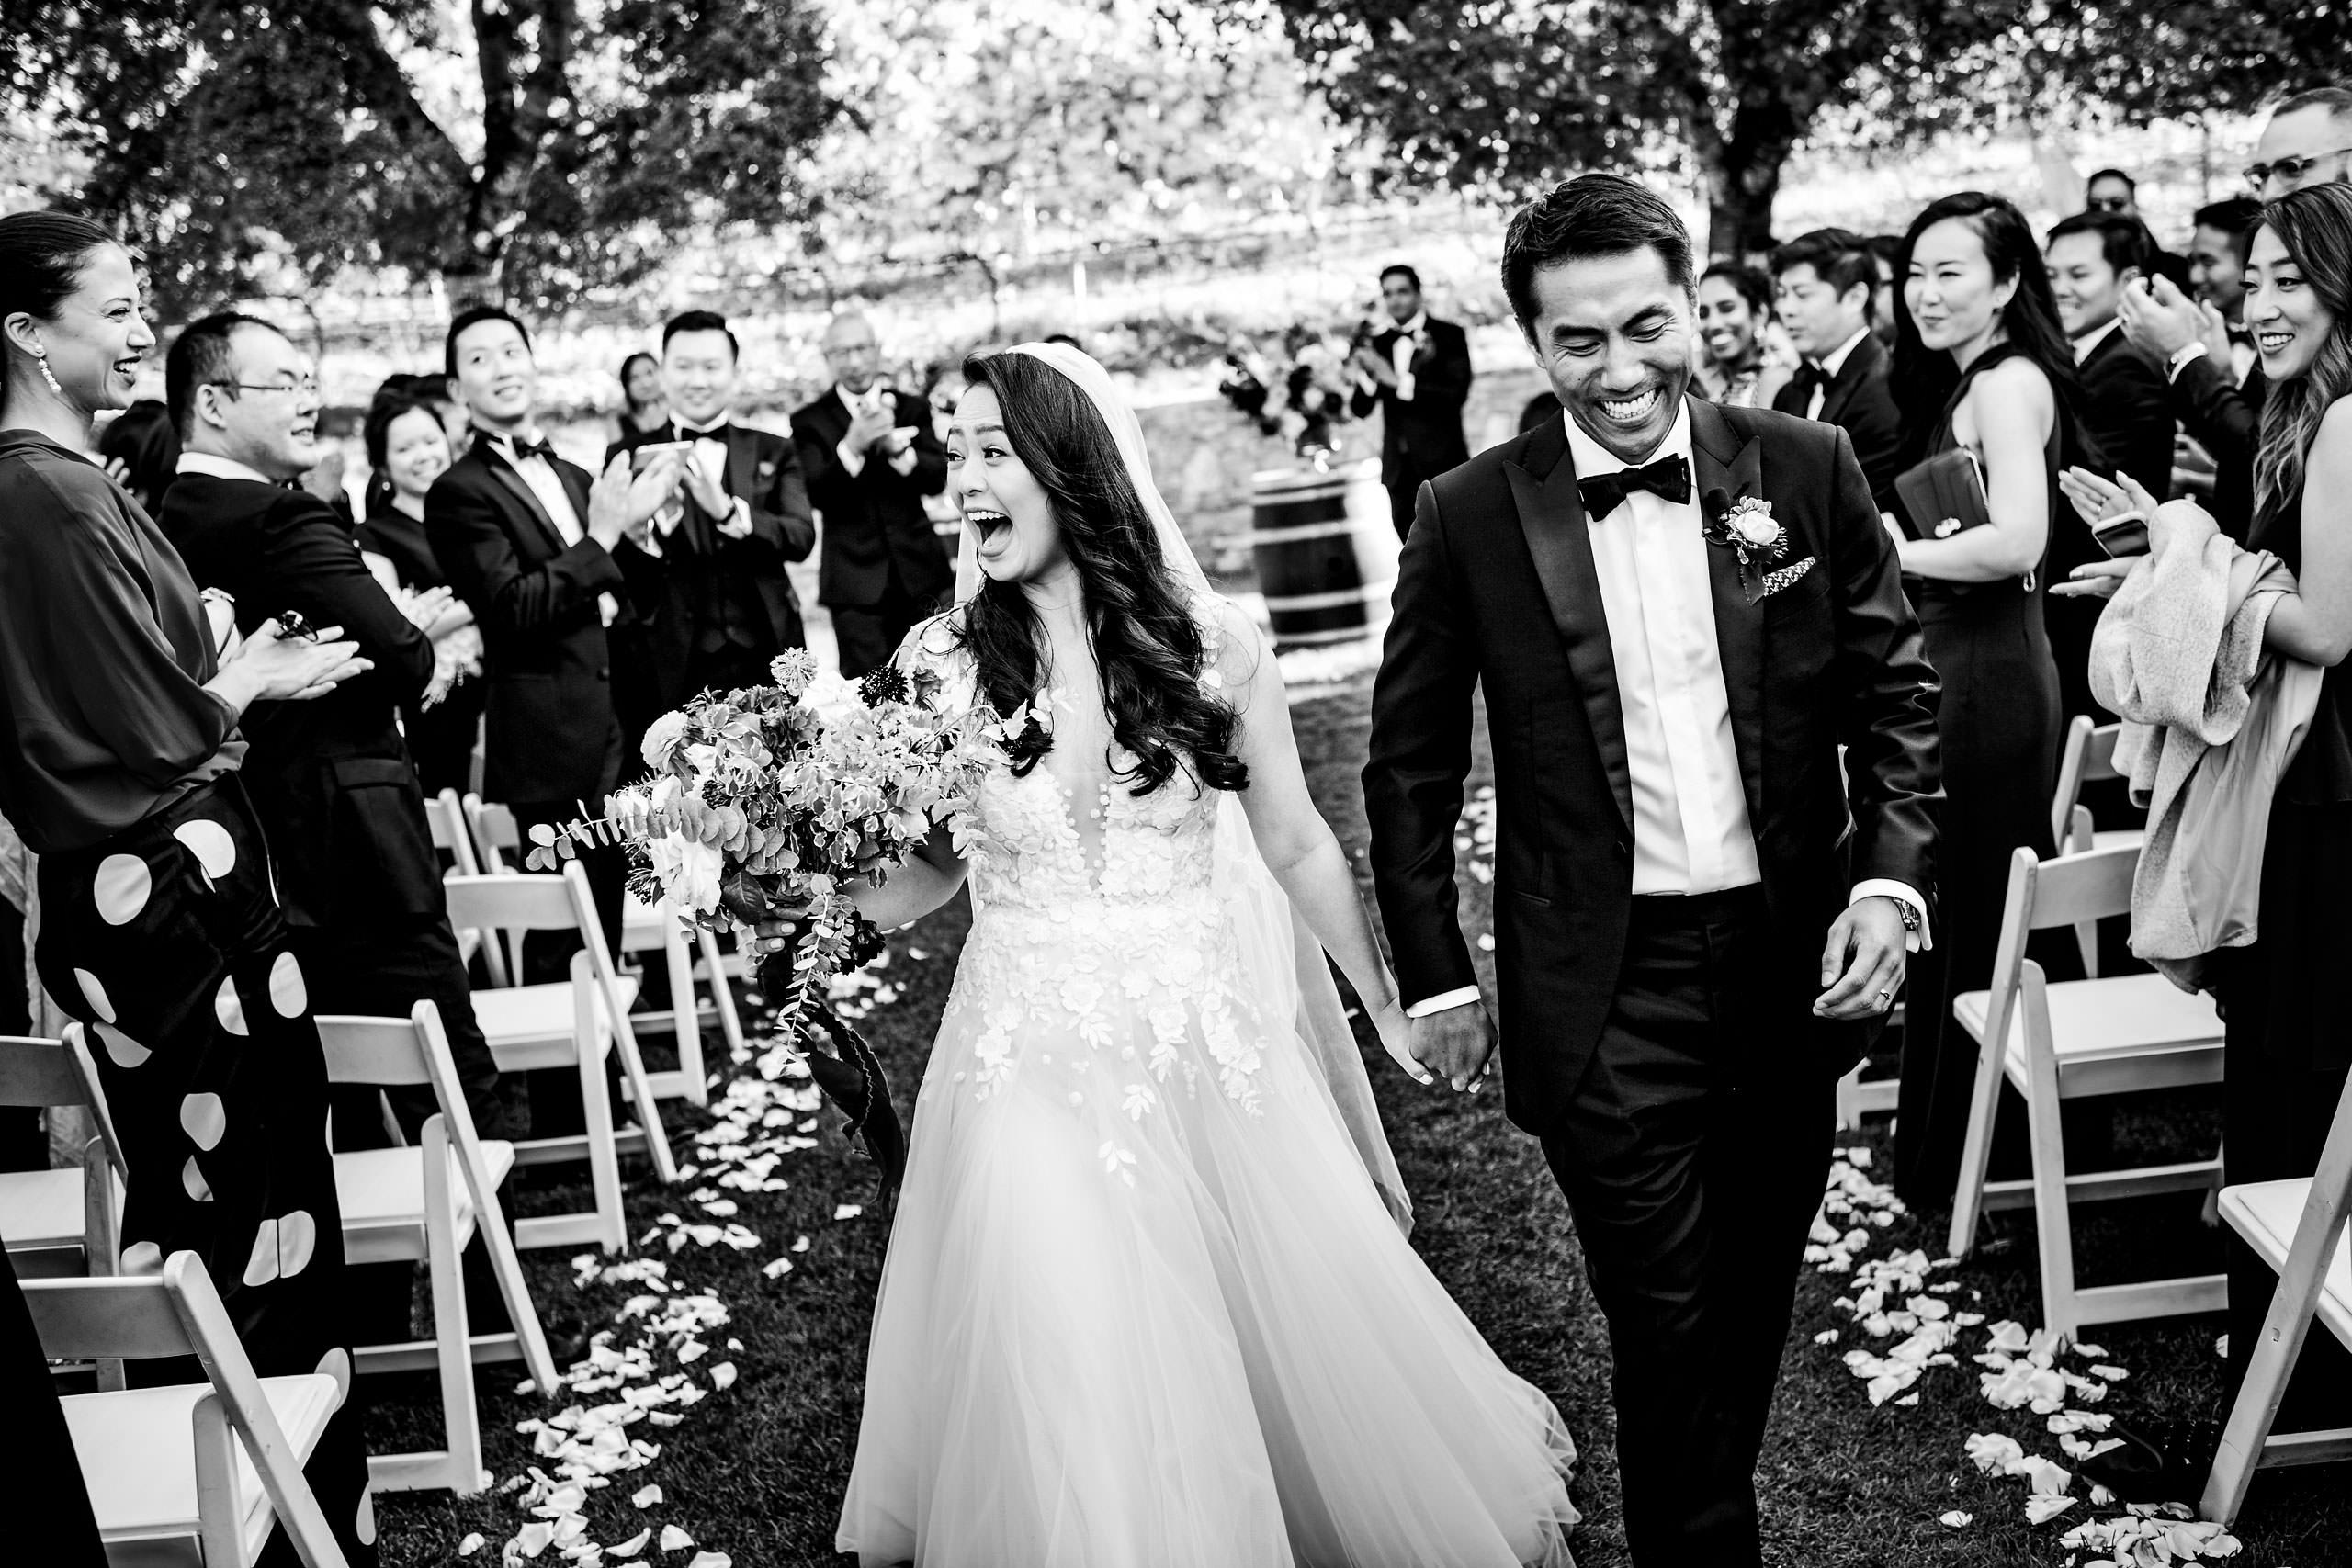 Ceremony by Carmel Valley Ranch Wedding Photographer Sean LeBlanc